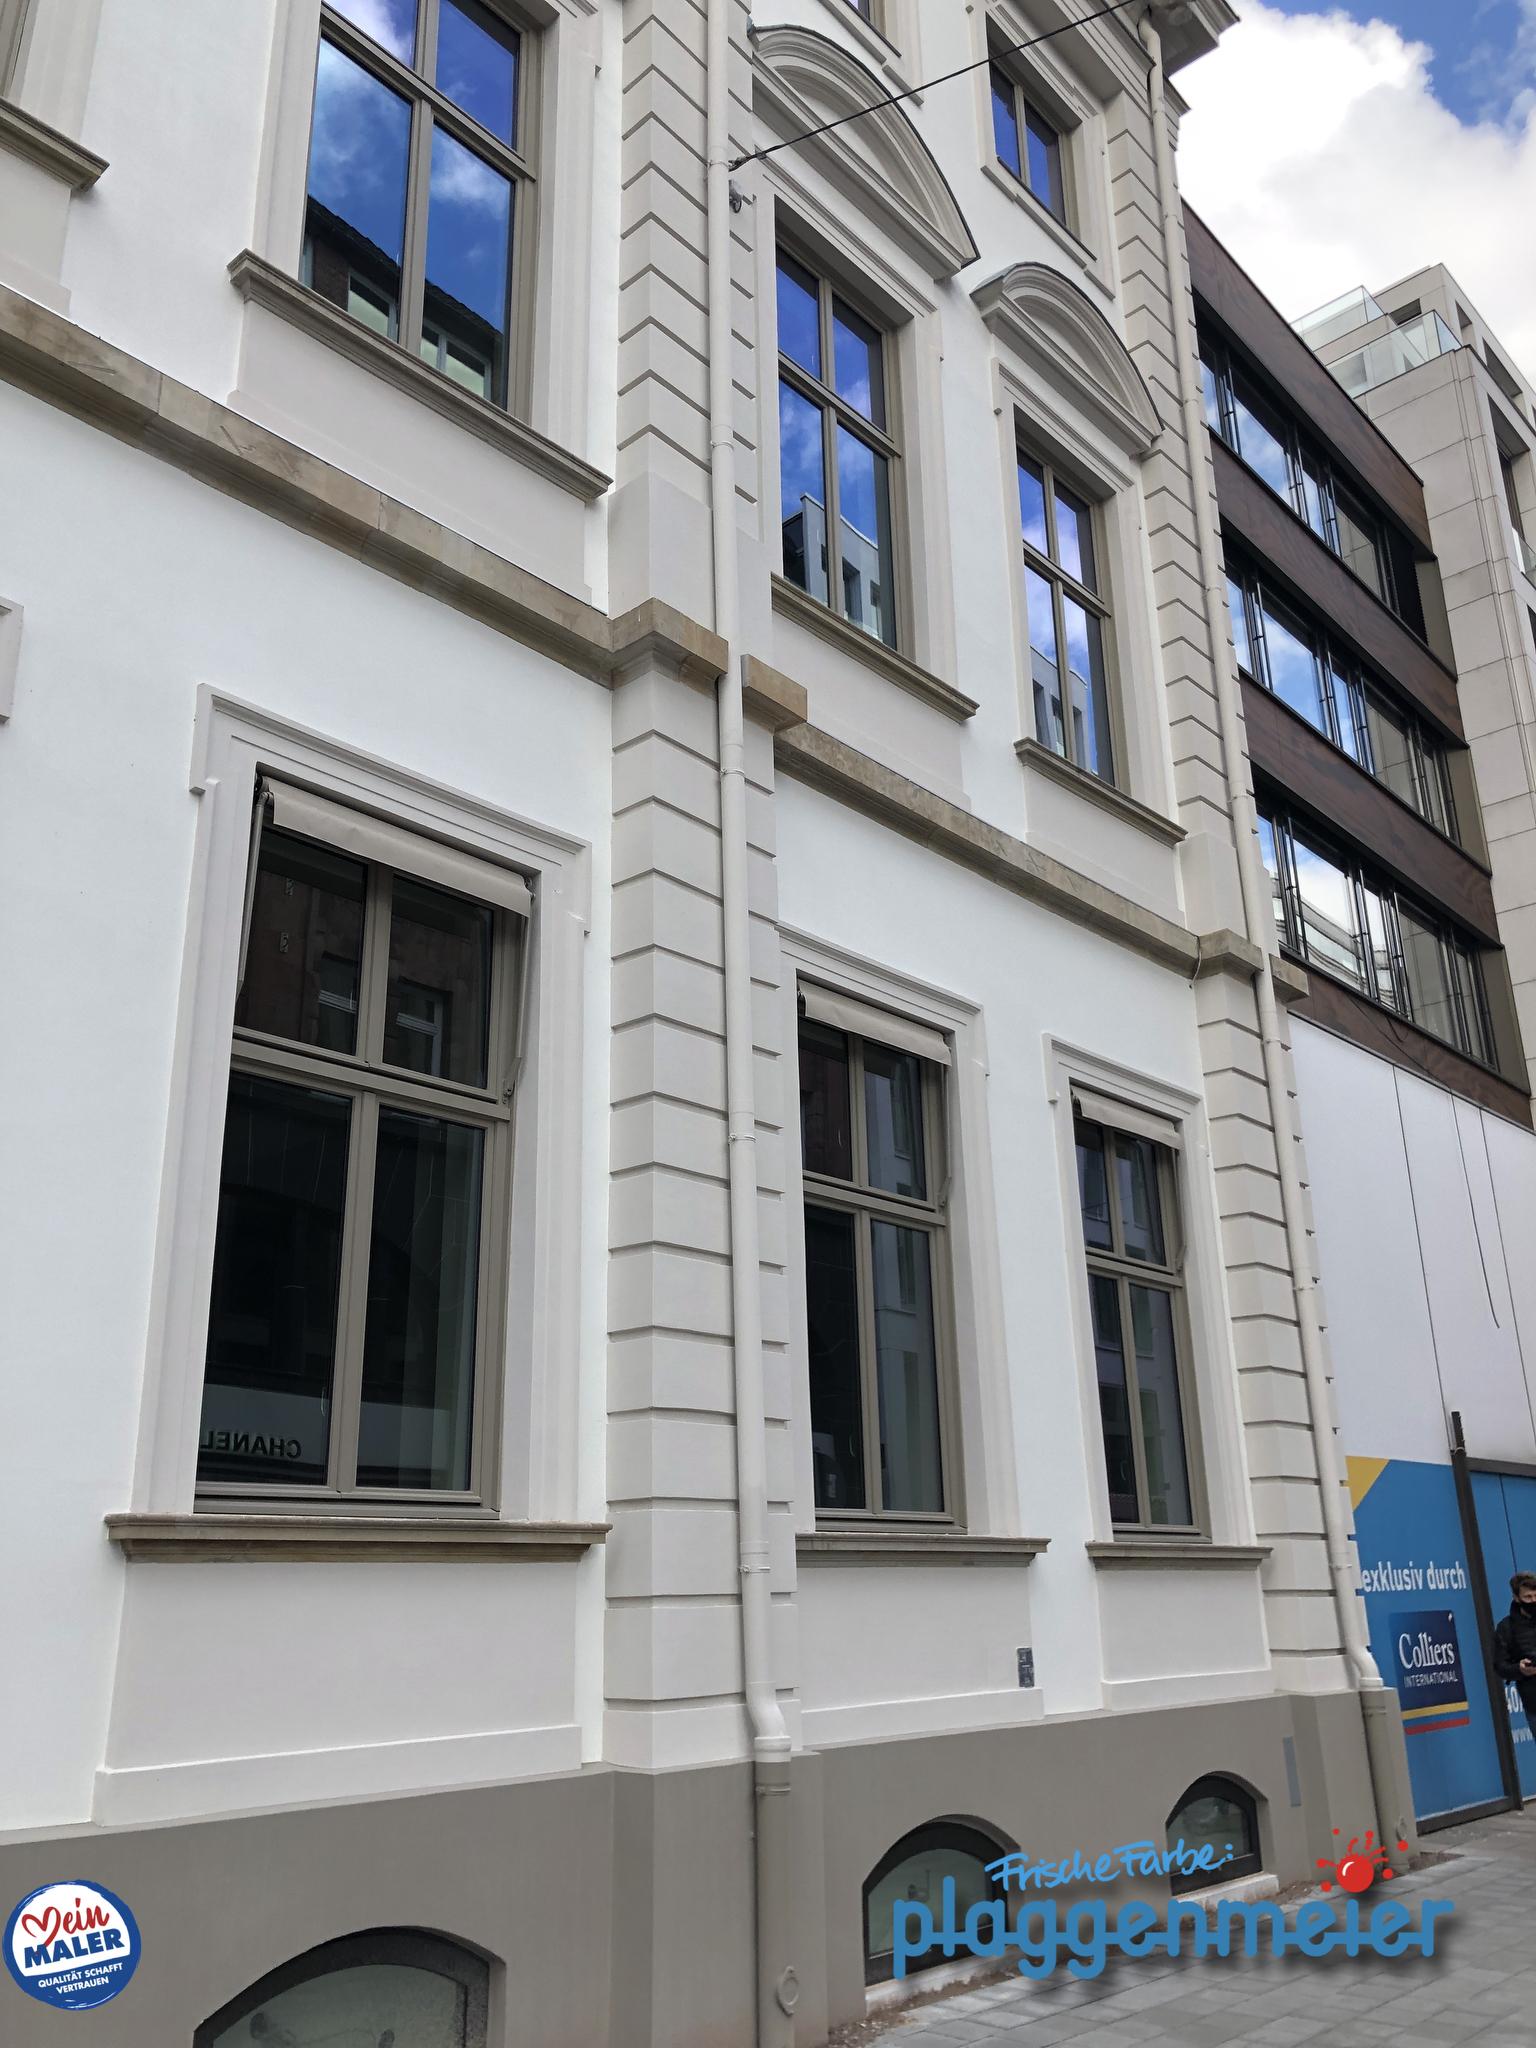 Denkmalgeschützte Fassaden müssen behutsam saniert werden. Maler aus Bremen am Görtz-Palais in Hamburg.